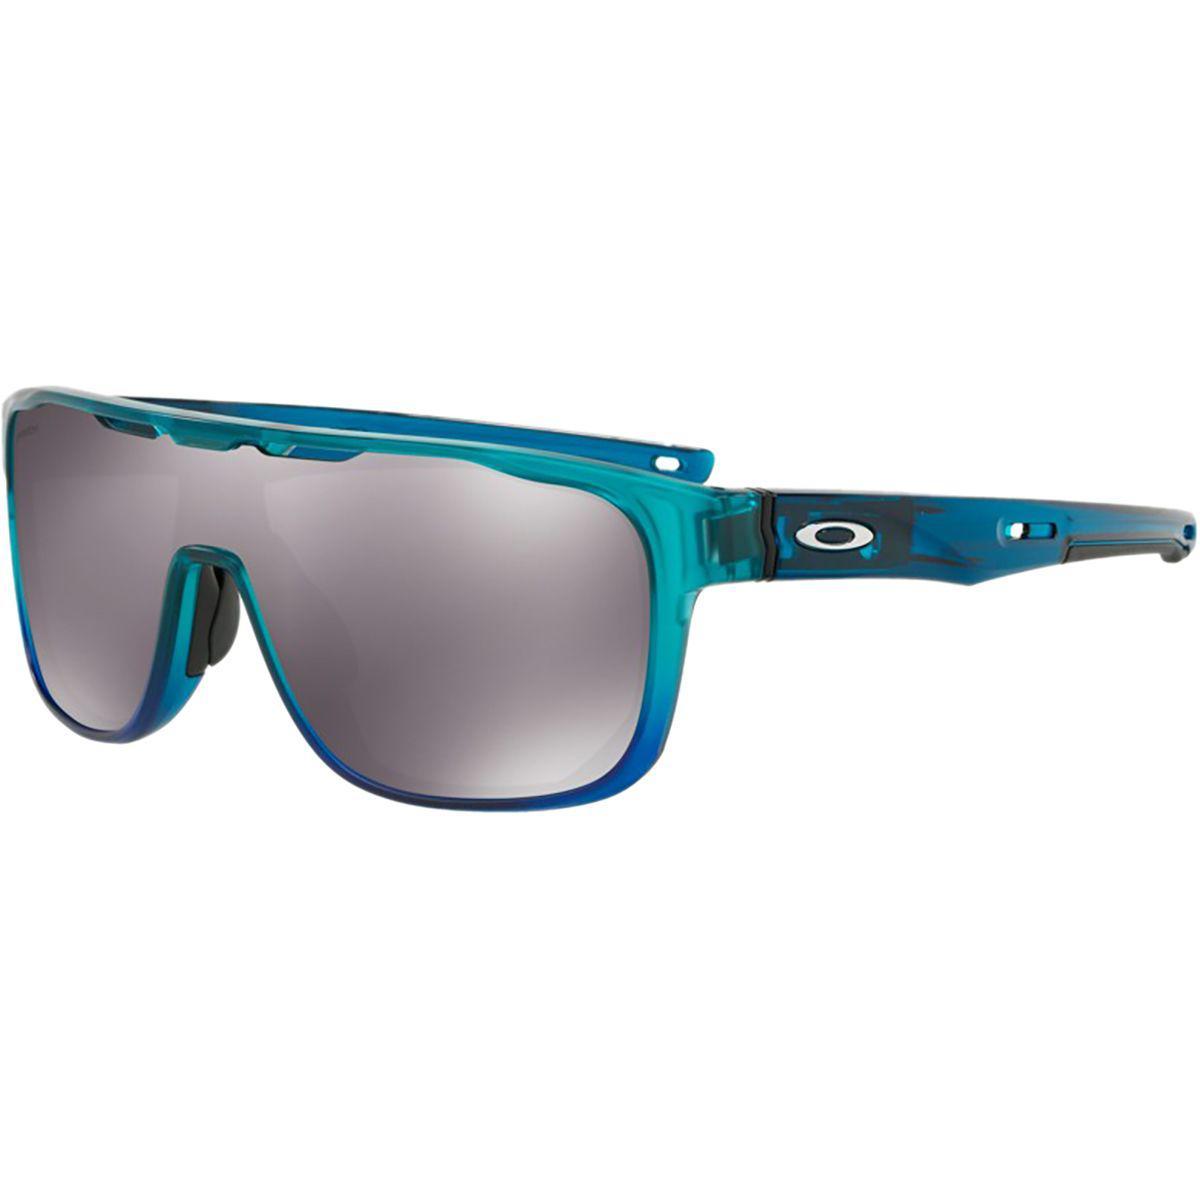 74ddb157aa ... authentic lyst oakley crossrange shield prizm sunglasses in blue for men  e2b1f 65d1a